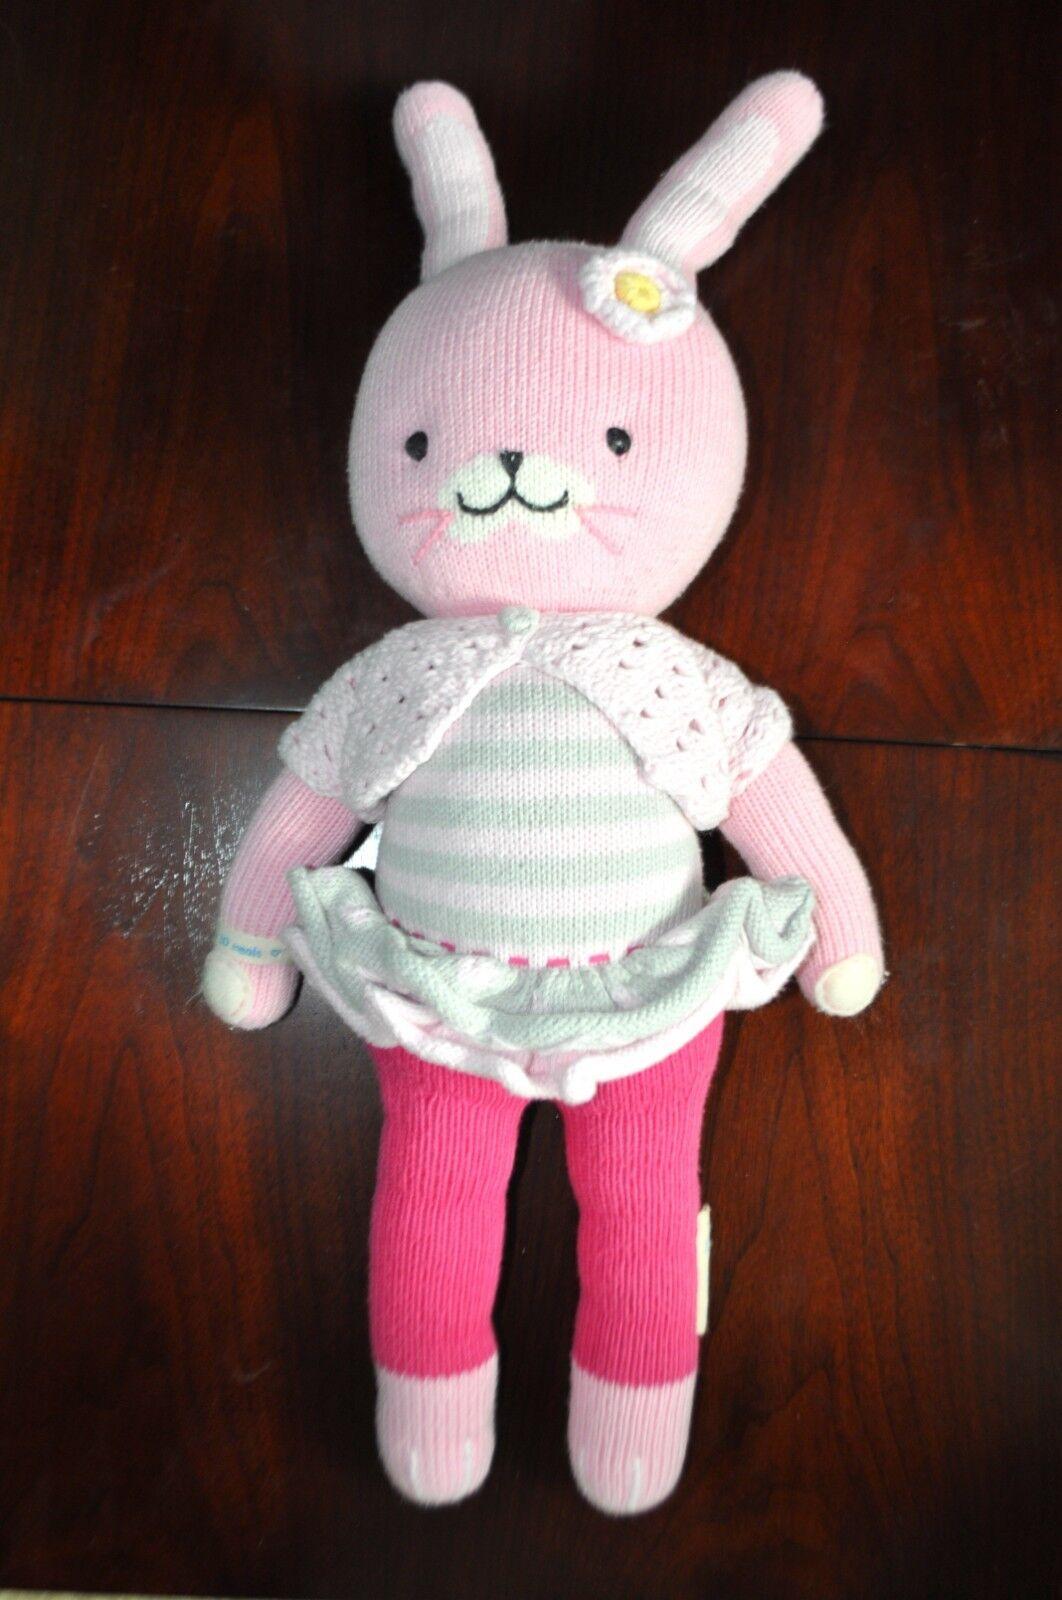 "Cuddle + Kind Plush Chloe The Bunny Rabbit Rosa Hand Knit Doll 20"" Stuffed Toy"